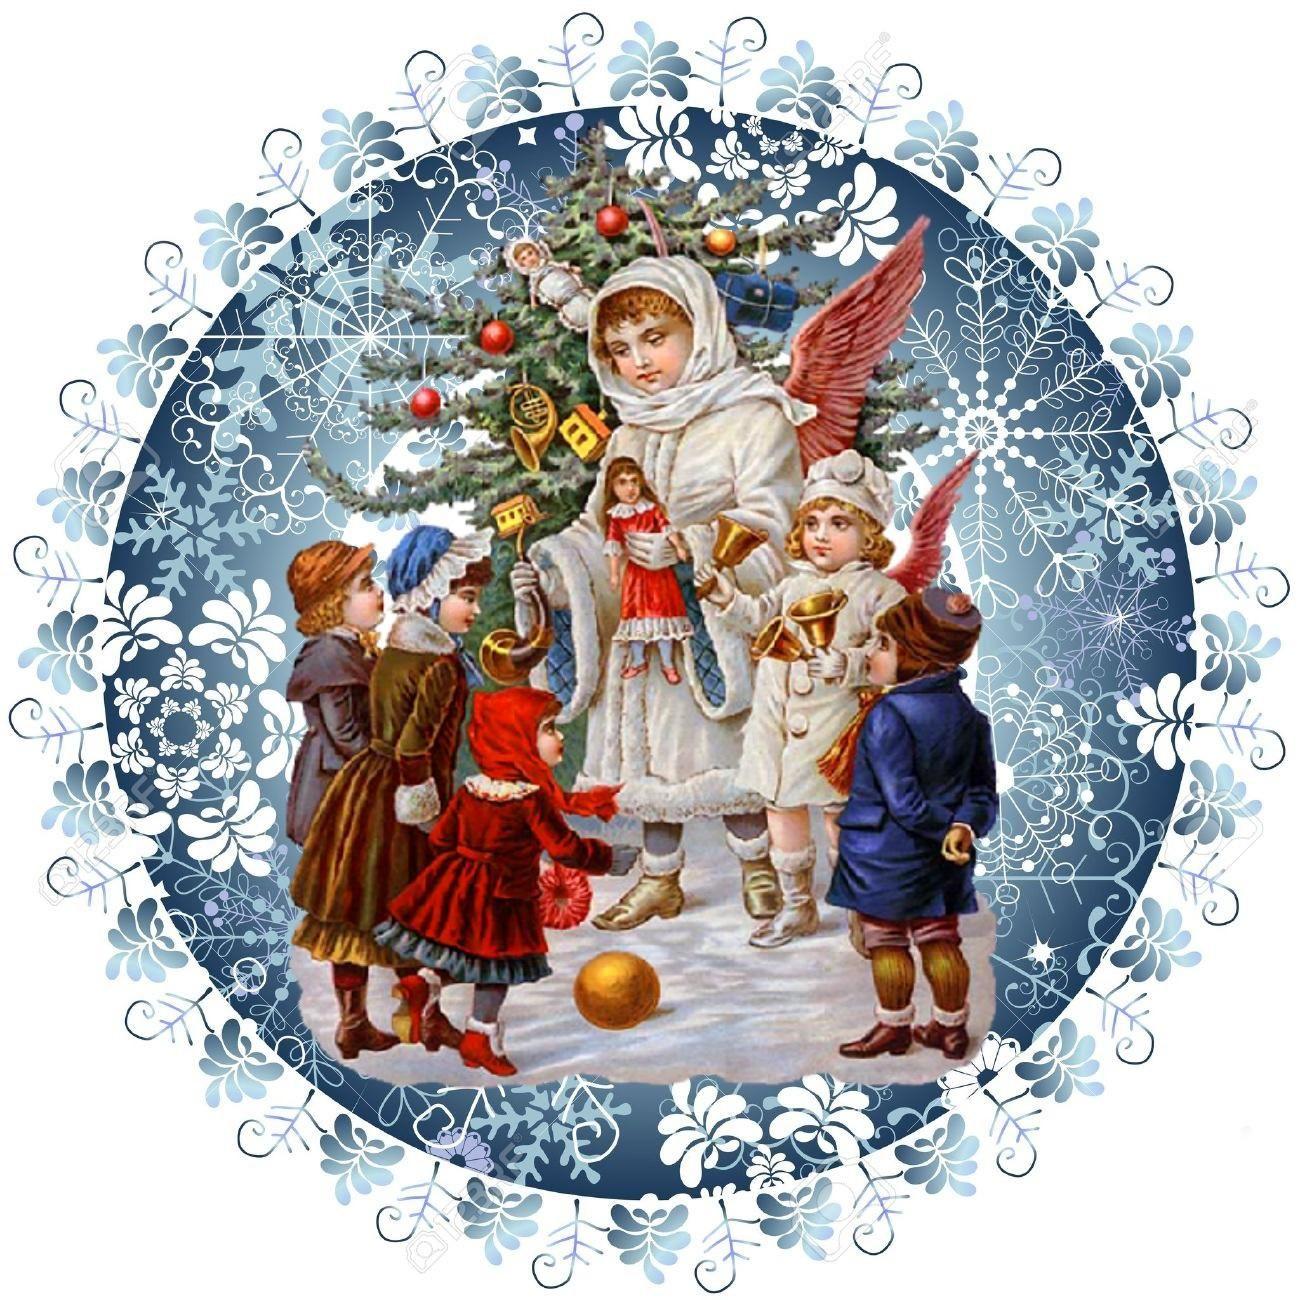 Открытка с символами рождества, картинки спасибо